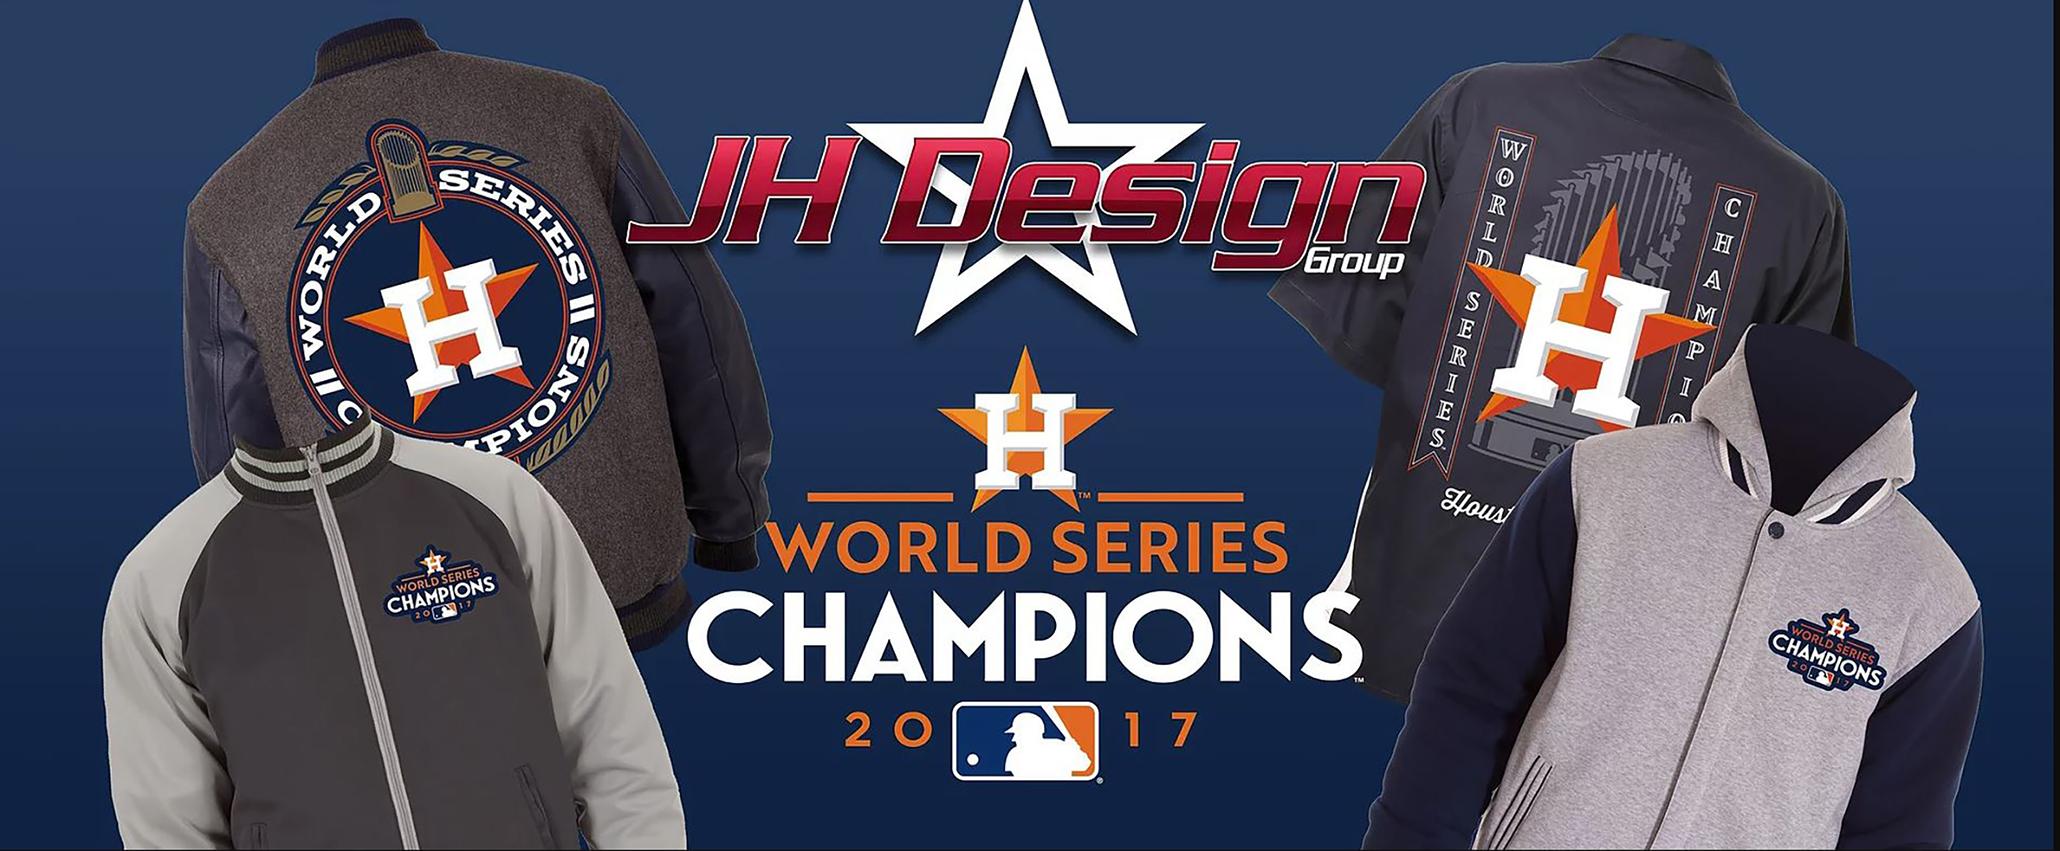 2017 WORLD SERIES CHAMPIONS HOUSTON ASTROS